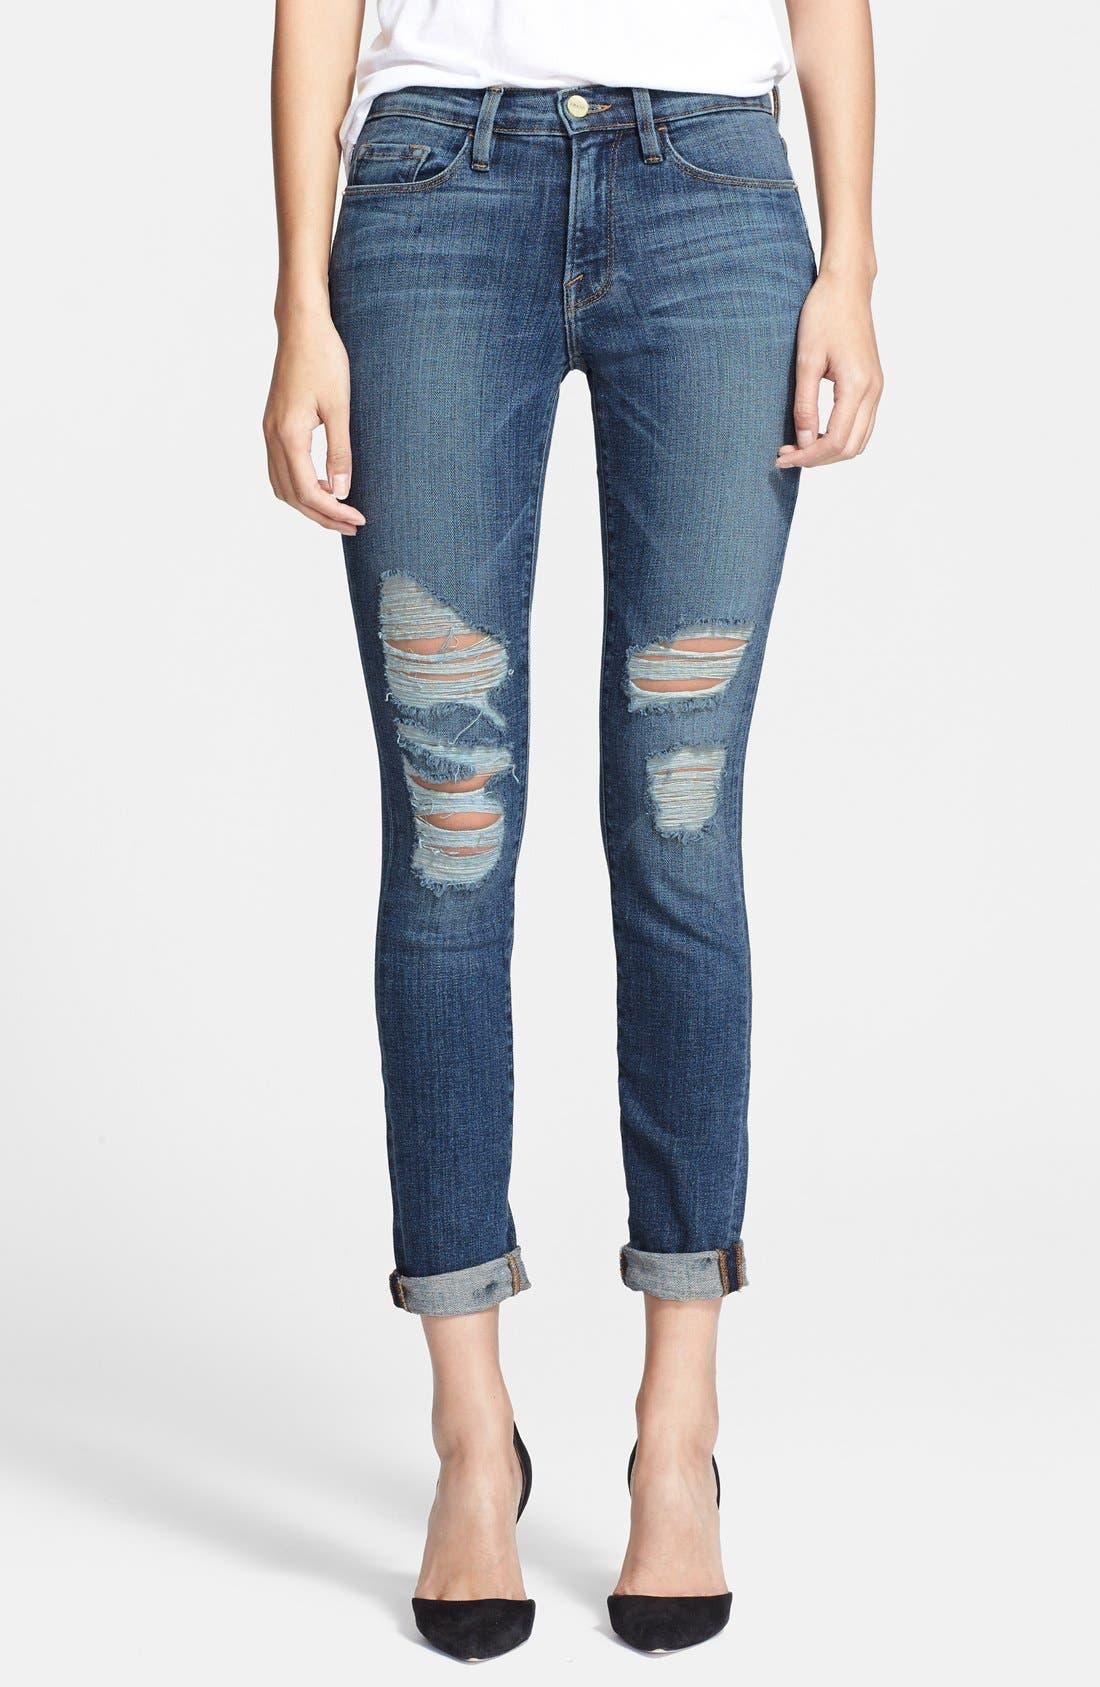 FRAME, Denim 'Le Skinny de Jeanne' Destroyed Jeans, Main thumbnail 1, color, 420